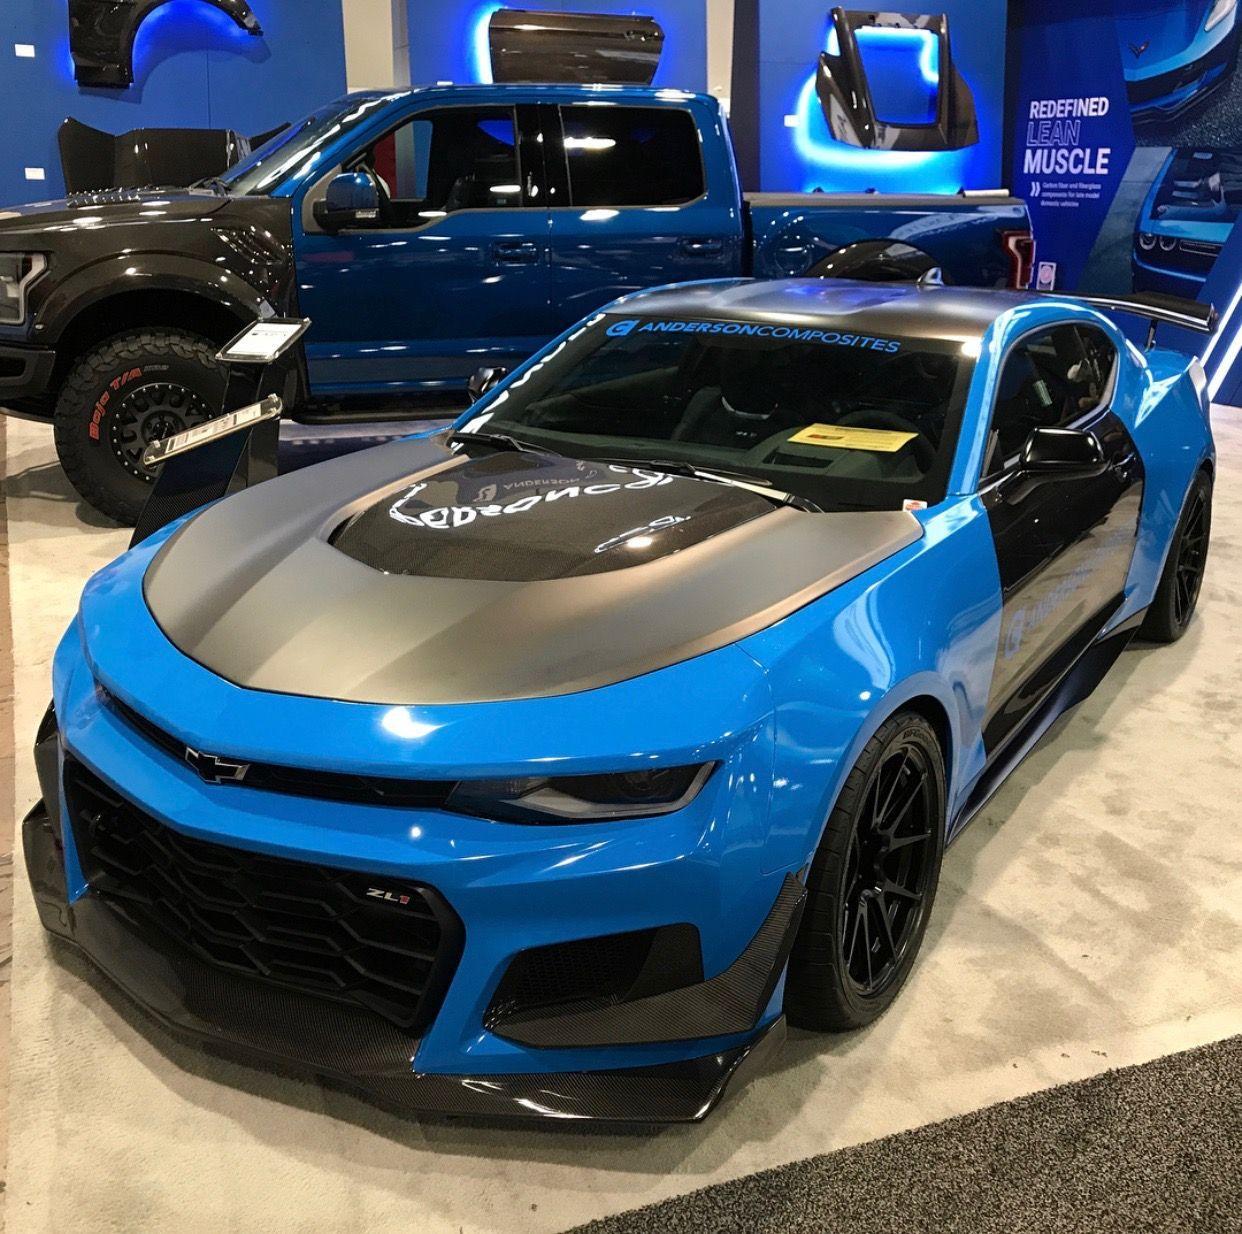 Chevrolet Camaro Zl1 1le Wrapped In Light Blue Black Photo Taken